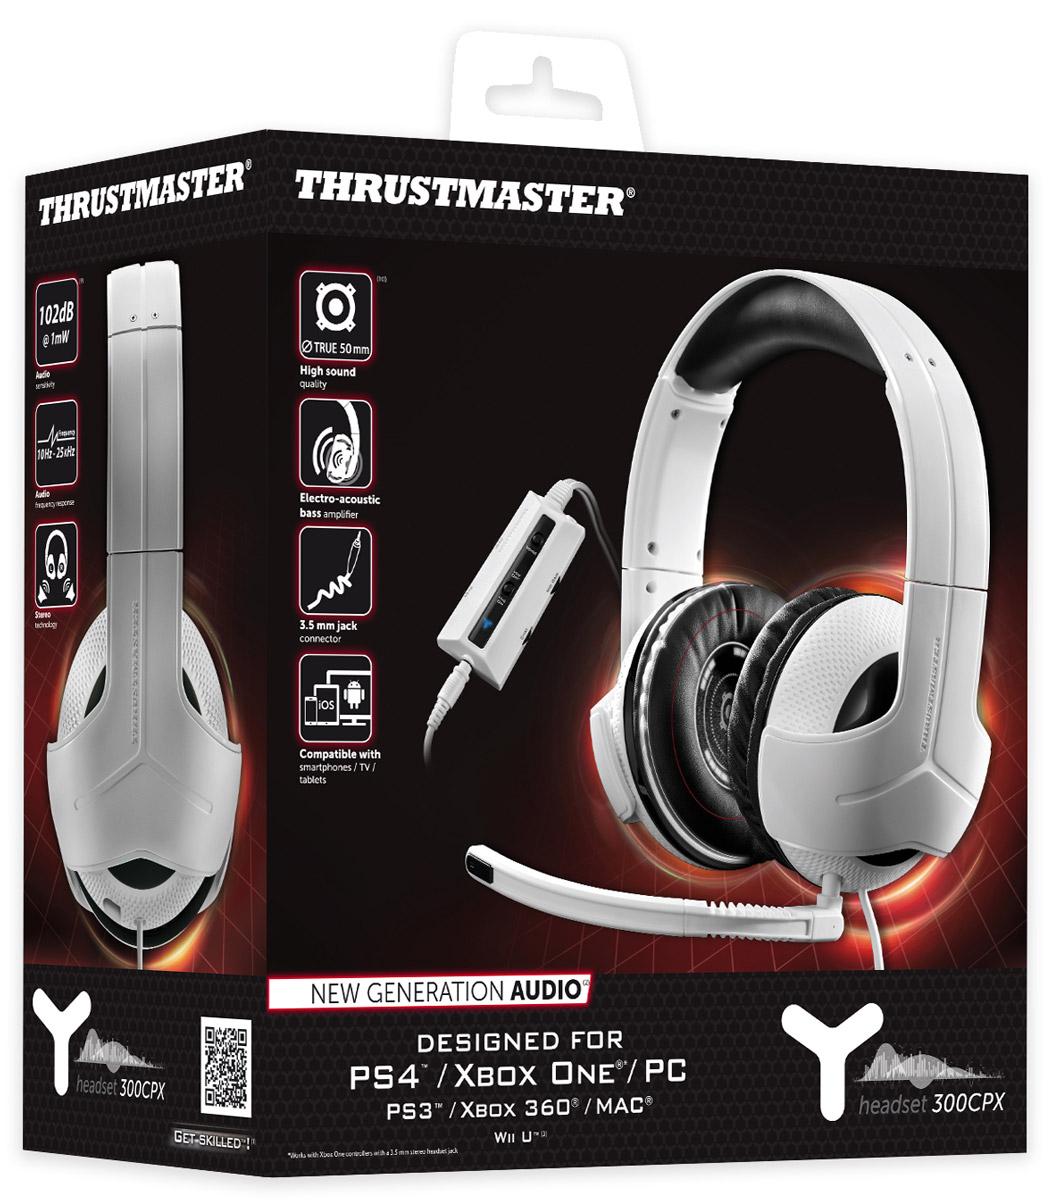 Thrustmaster Y300CPX игровая гарнитура для PS4 (4060077)